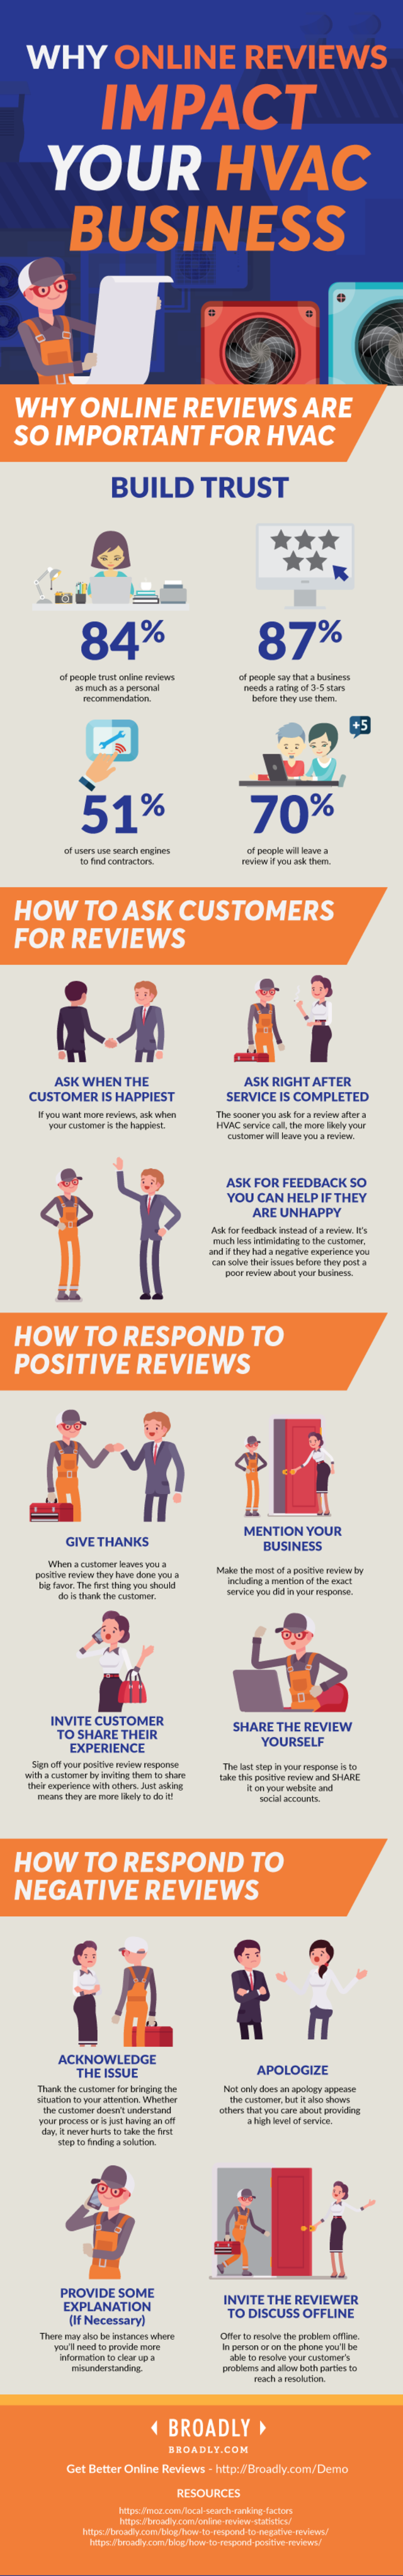 Hvac business online reviews 1